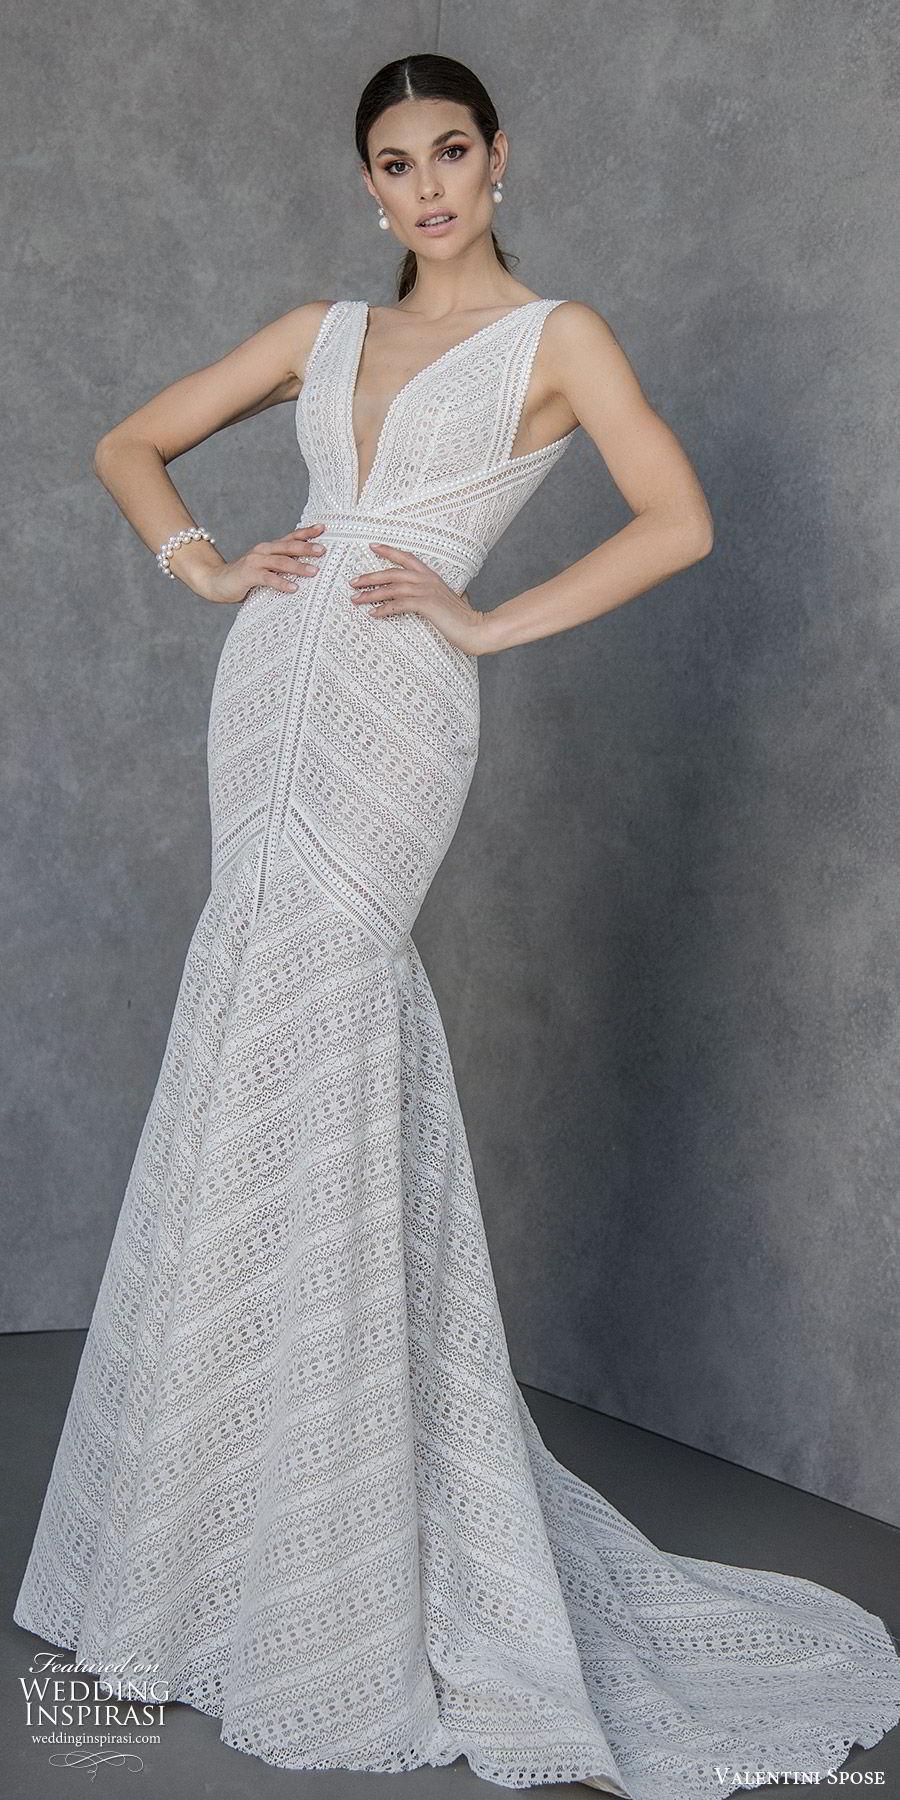 valentini spose spring 2020 bridal sleeveless thick straps deep v neckline fit flare mermaid wedding dress (5) v back chapel train modern boho chic mv